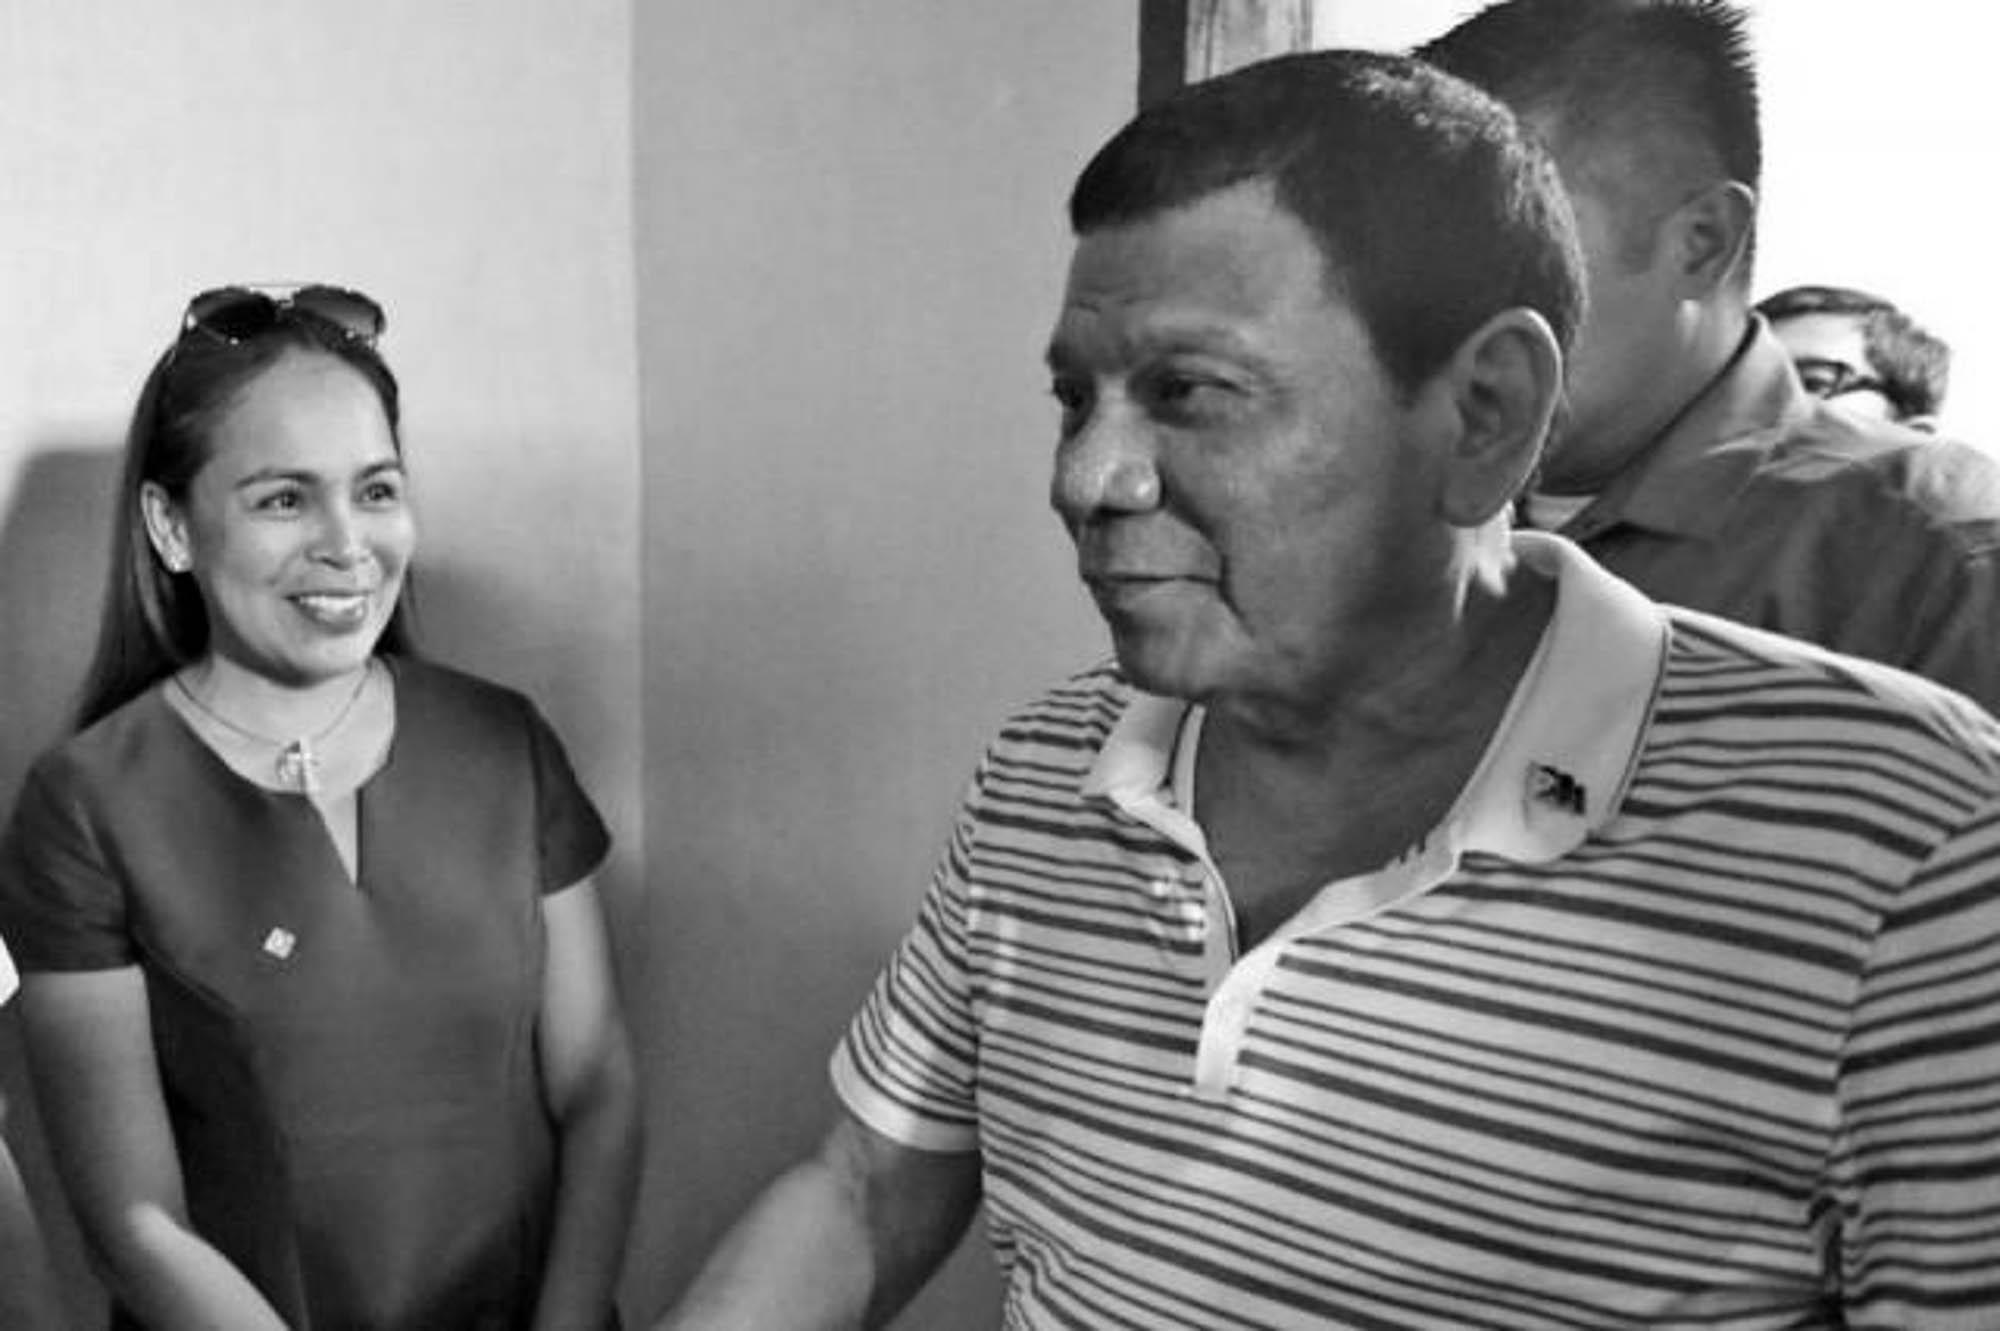 Filipino Trump Wants To Grab Pretty Mayor By Her Undies